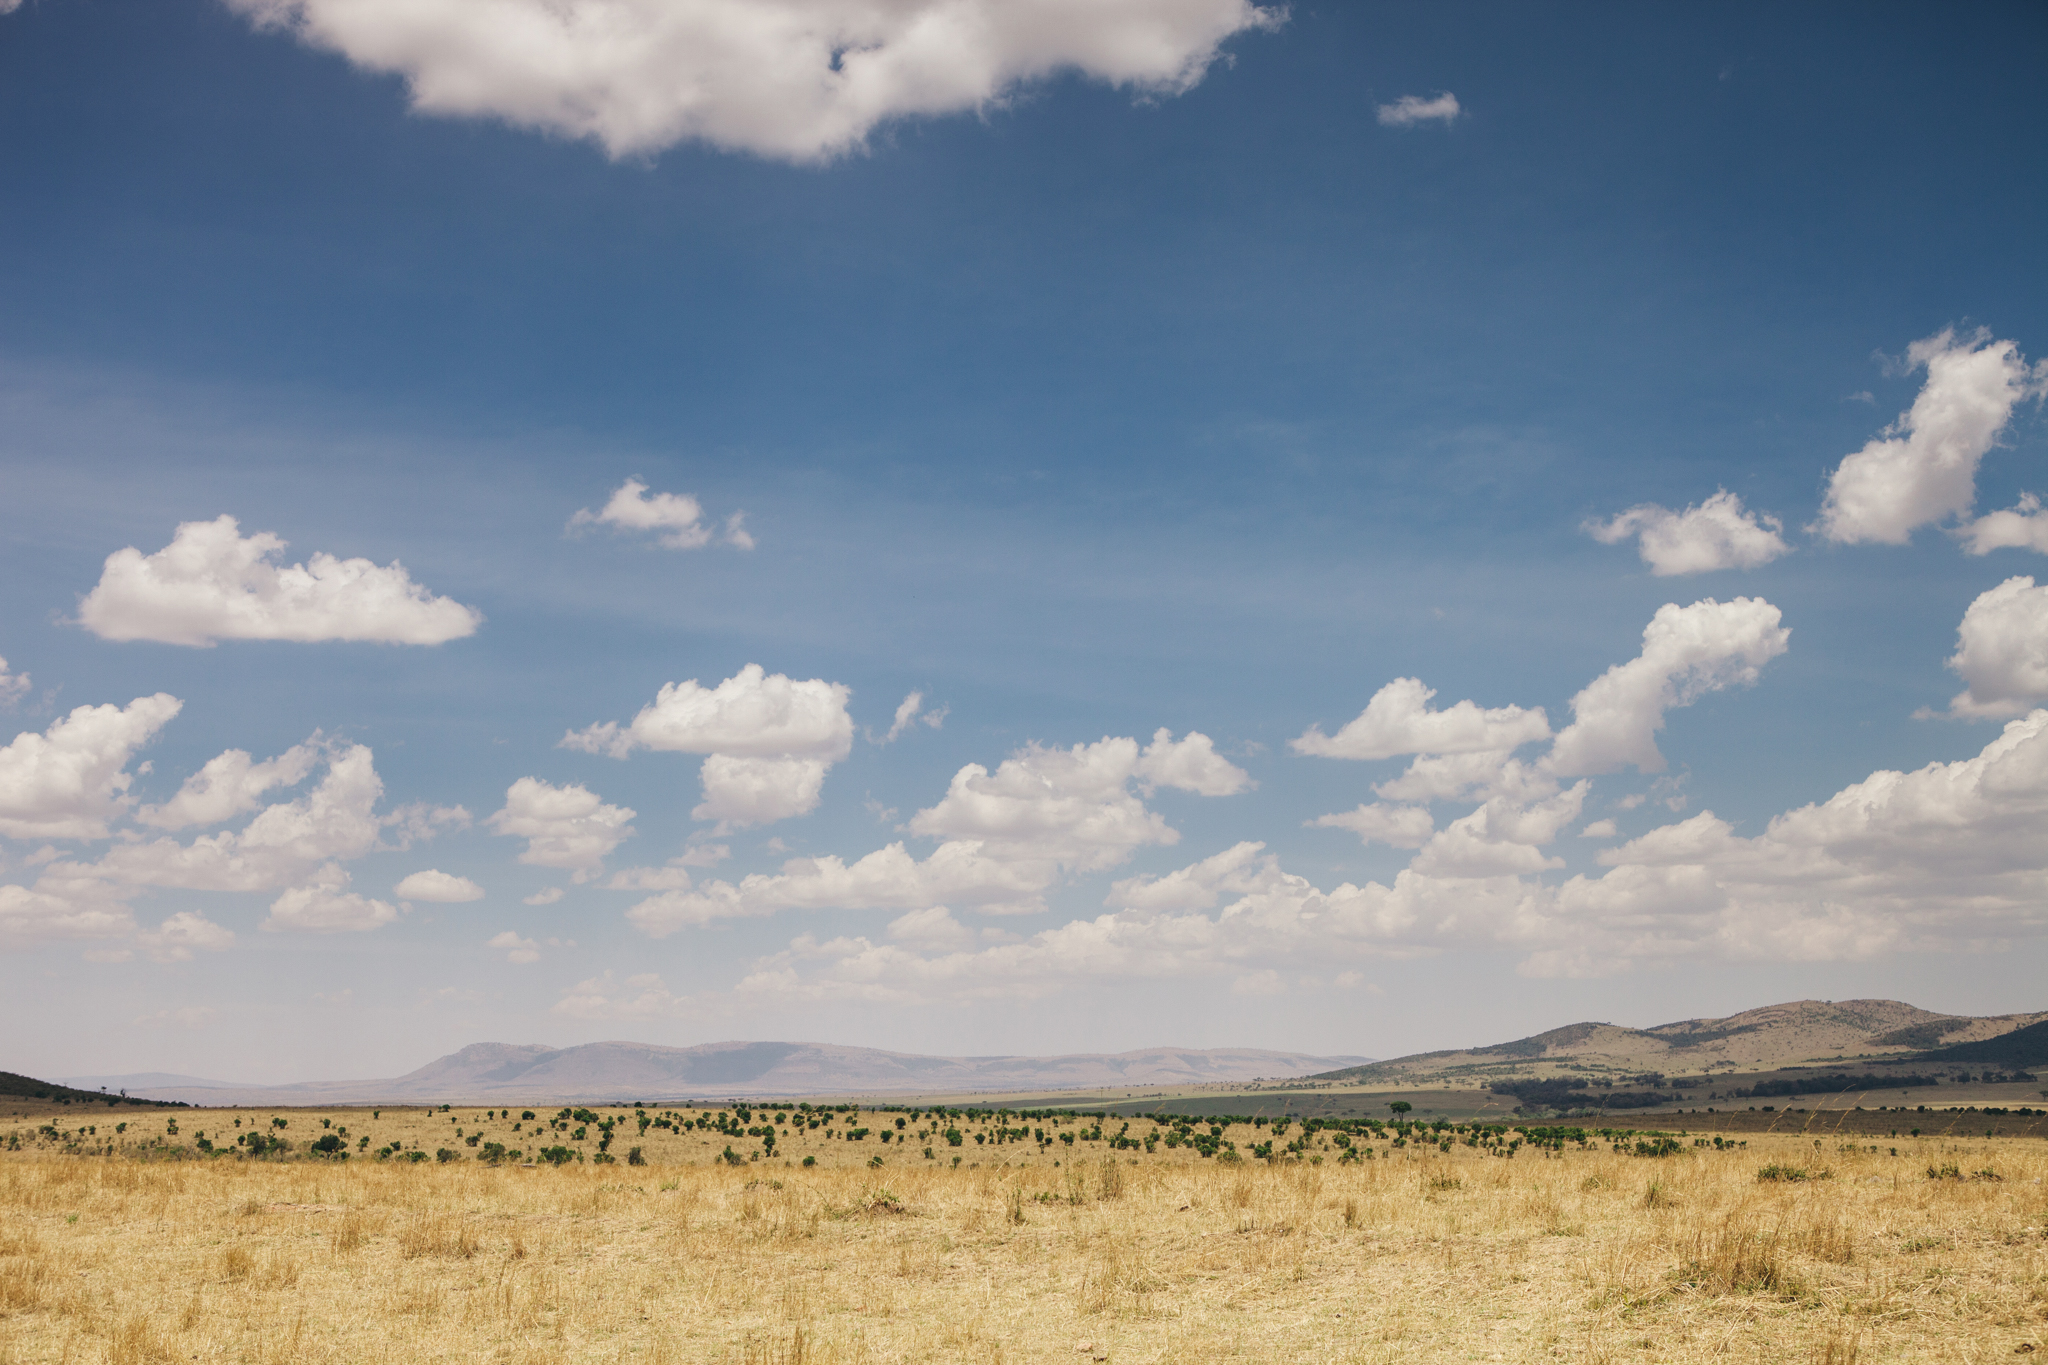 Kenya-138.jpg